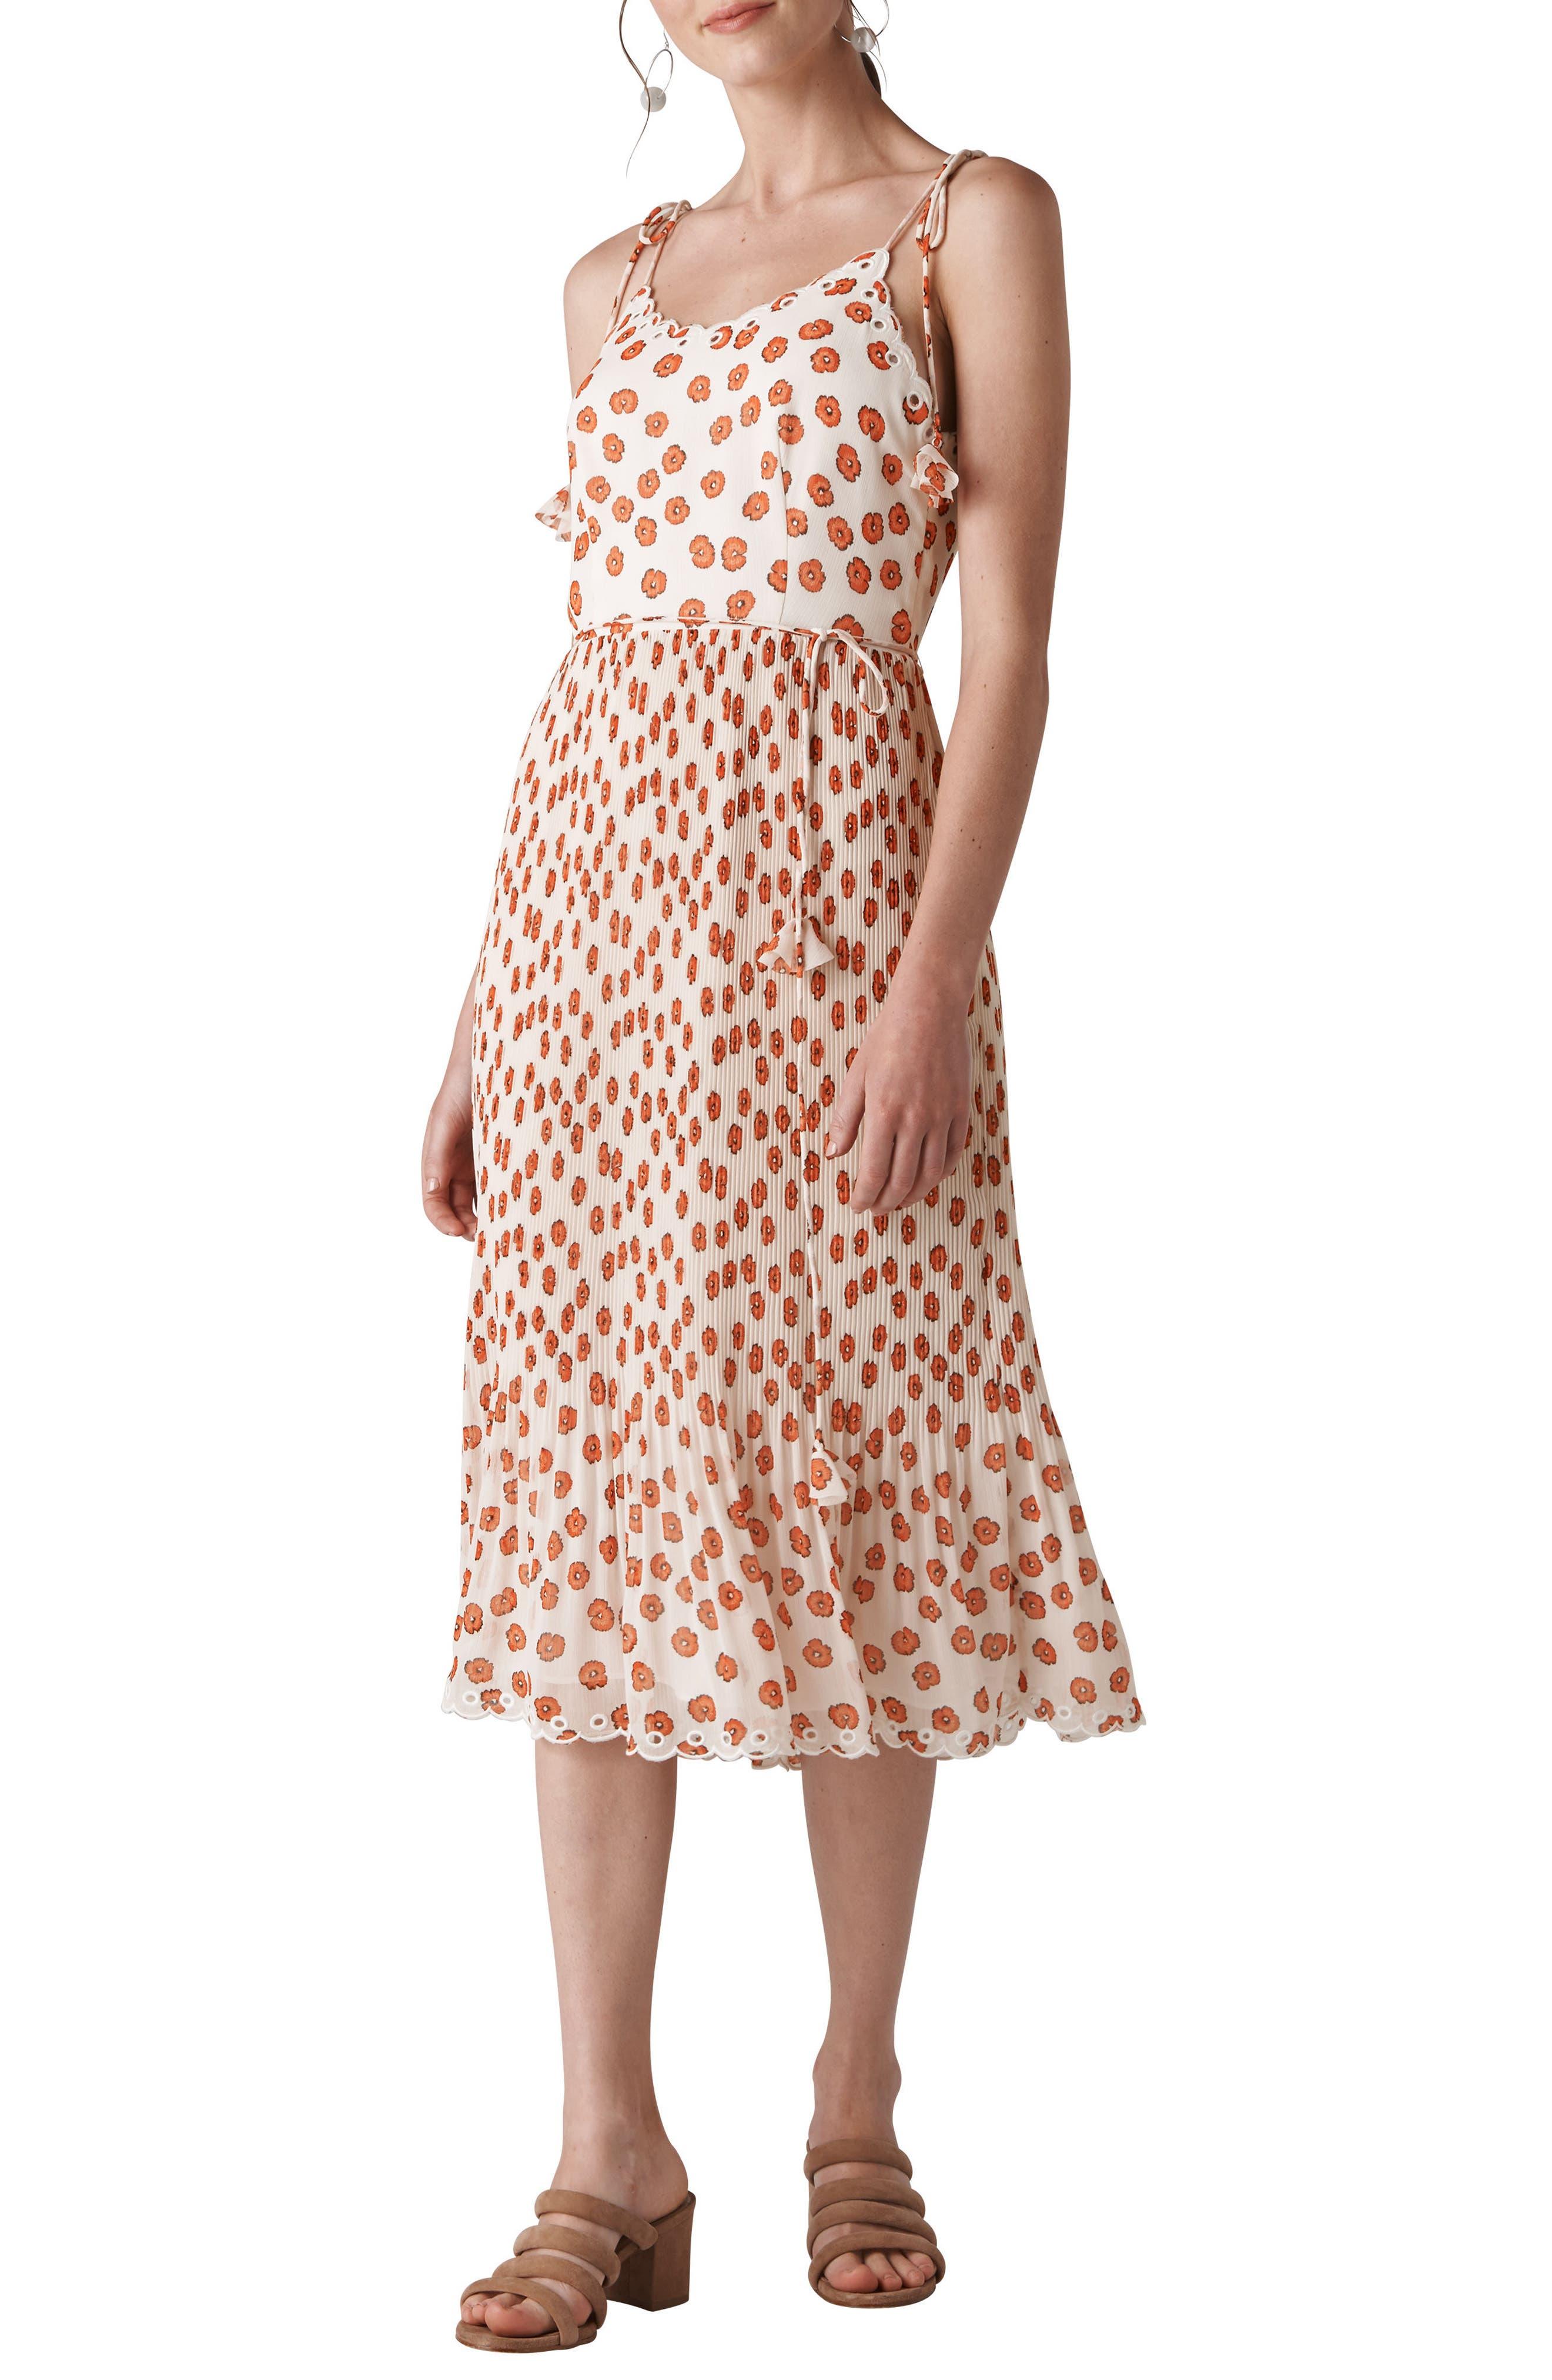 Salome Lenno Print Midi Dress,                         Main,                         color, 100